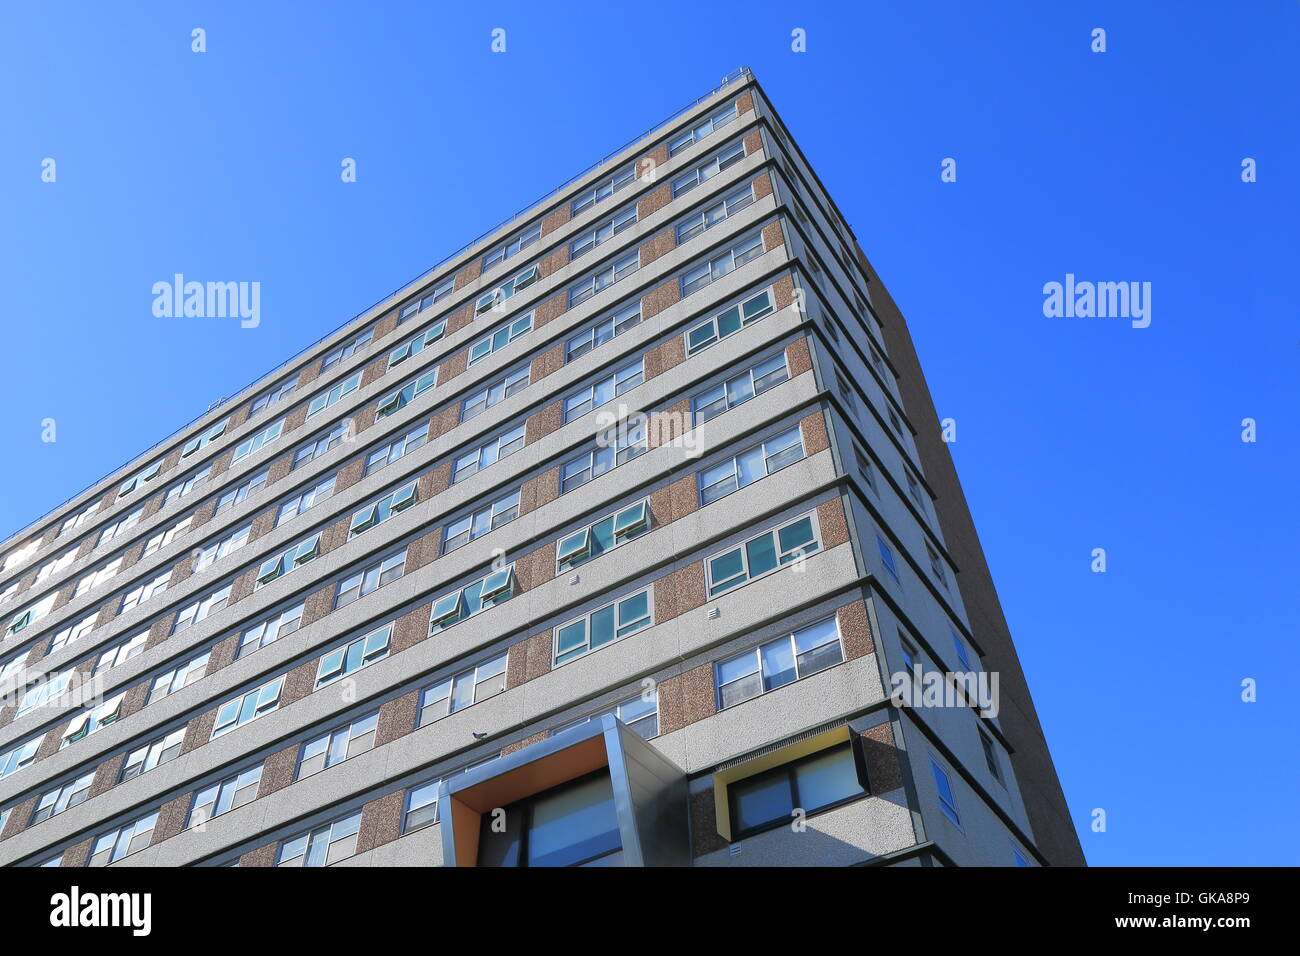 Public Housing building in Melbourne Australia. - Stock Image